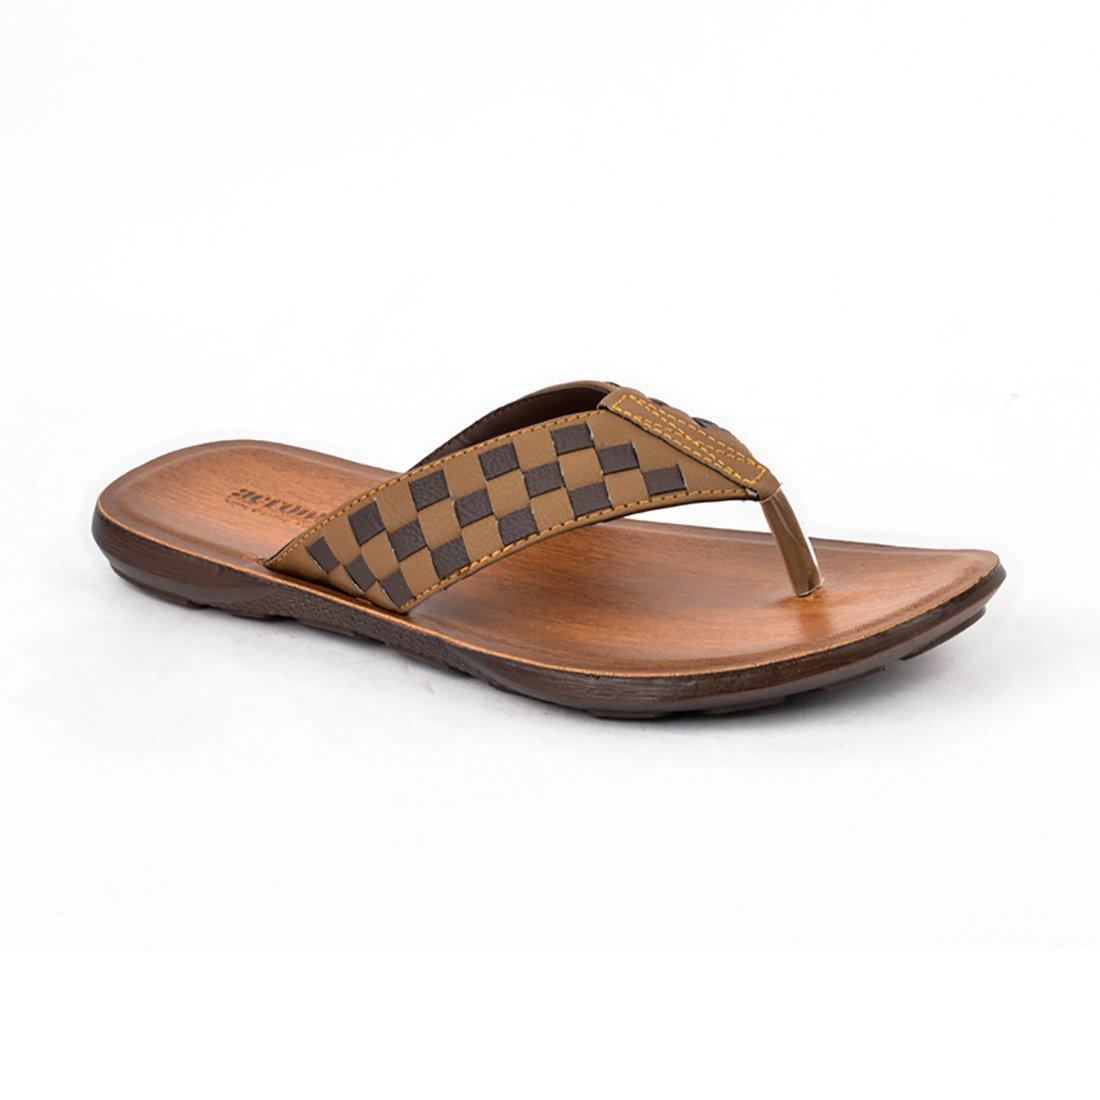 Buy AEROWALK Mens Slipper and sandal